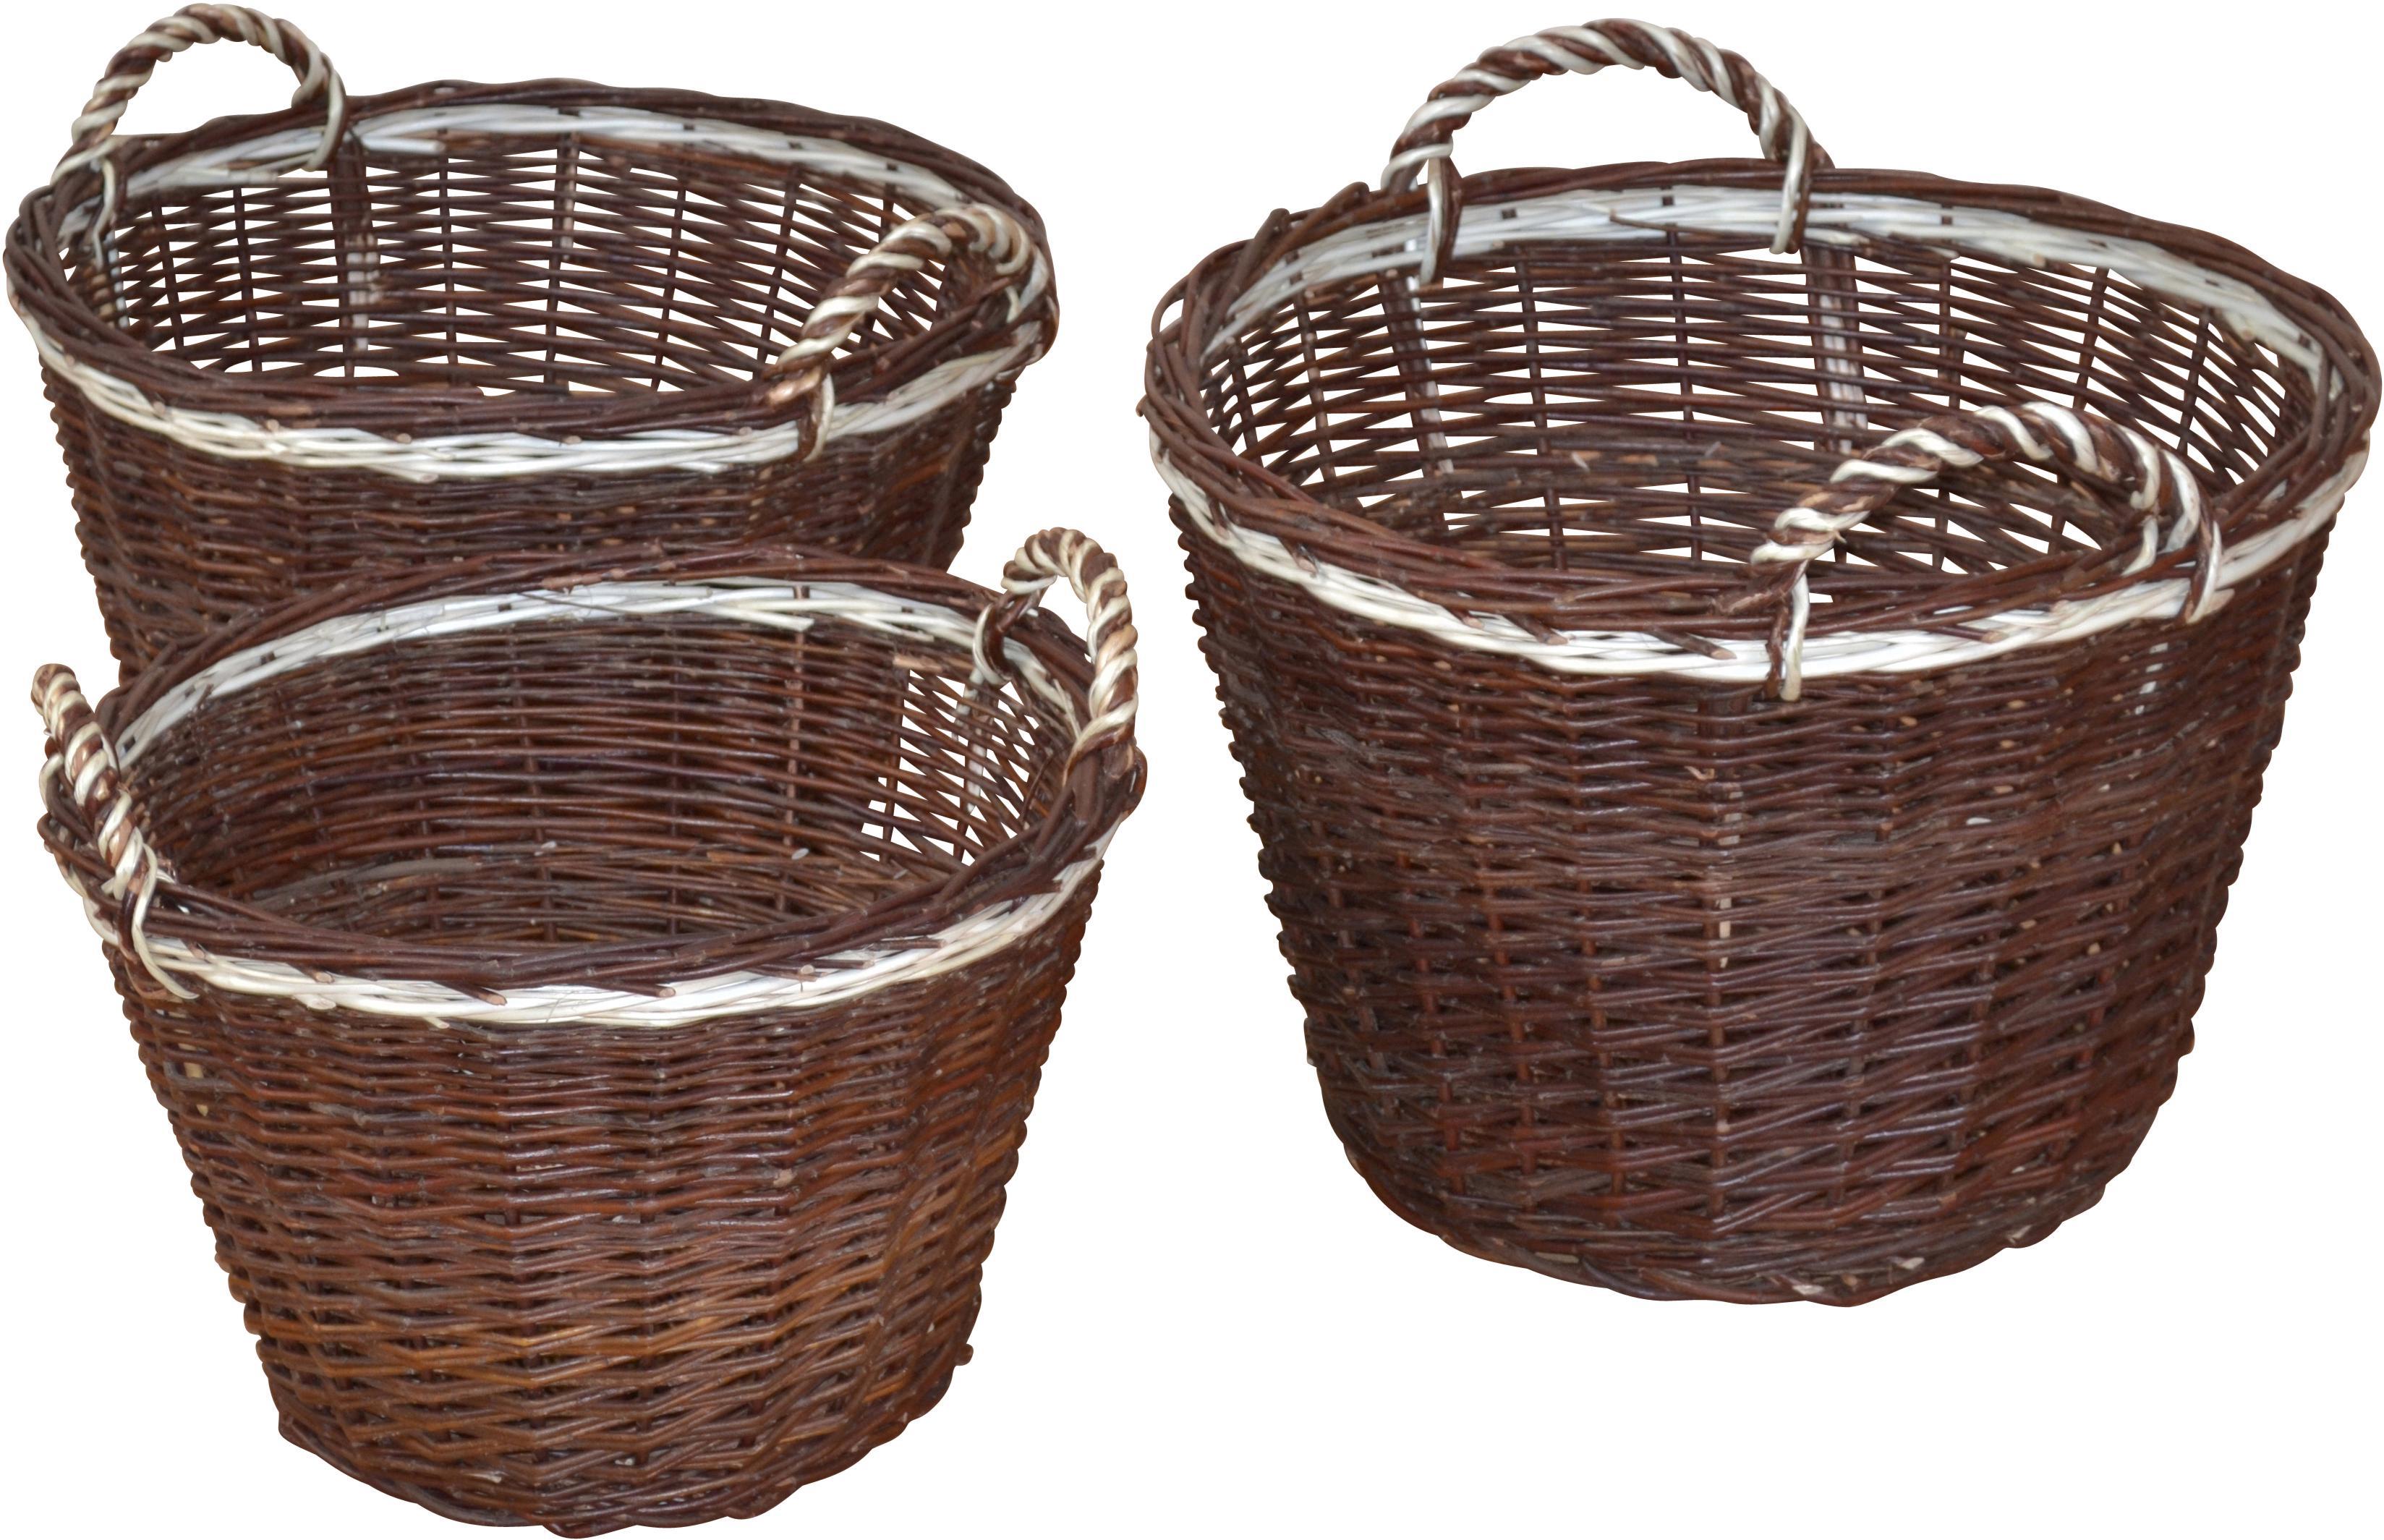 Aufbewahrungskorb, (Set, 3 St.), Ø 45, 50, 54 cm braun Körbe Aufbewahrung Ordnung Wohnaccessoires Aufbewahrungskorb